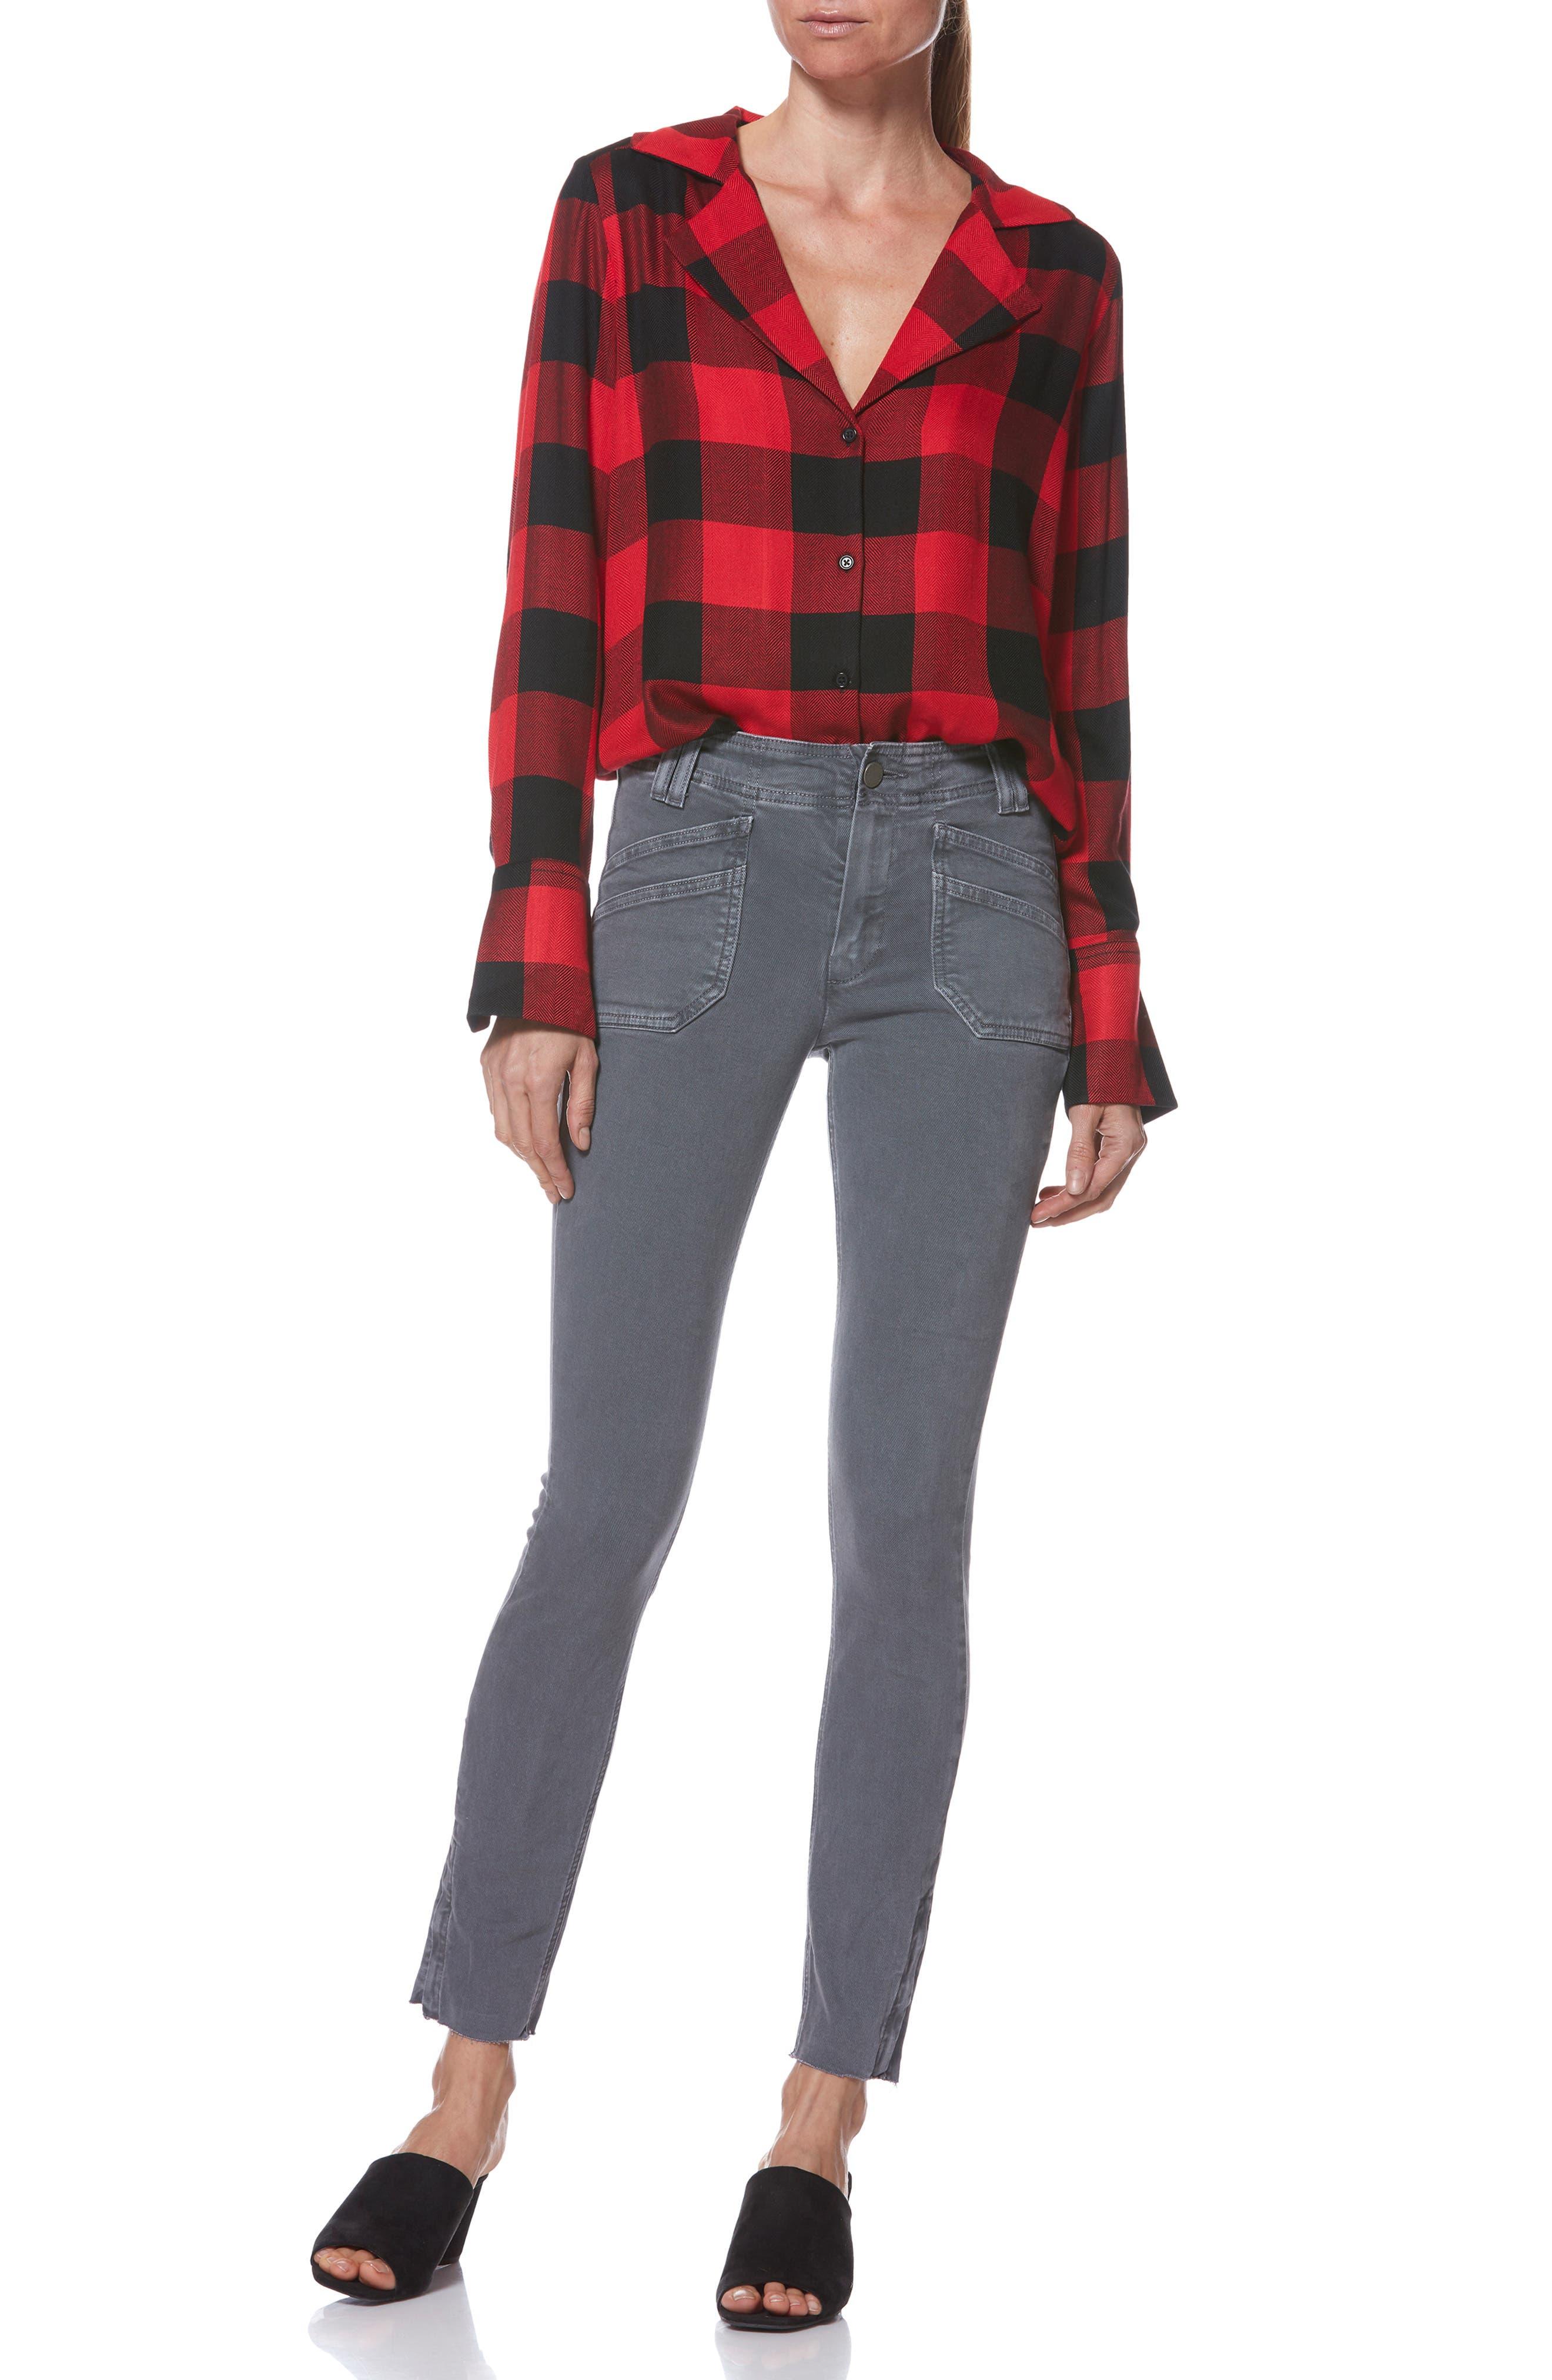 PAIGE,                             Elora Shirt,                             Alternate thumbnail 7, color,                             TRUE RED / BLACK